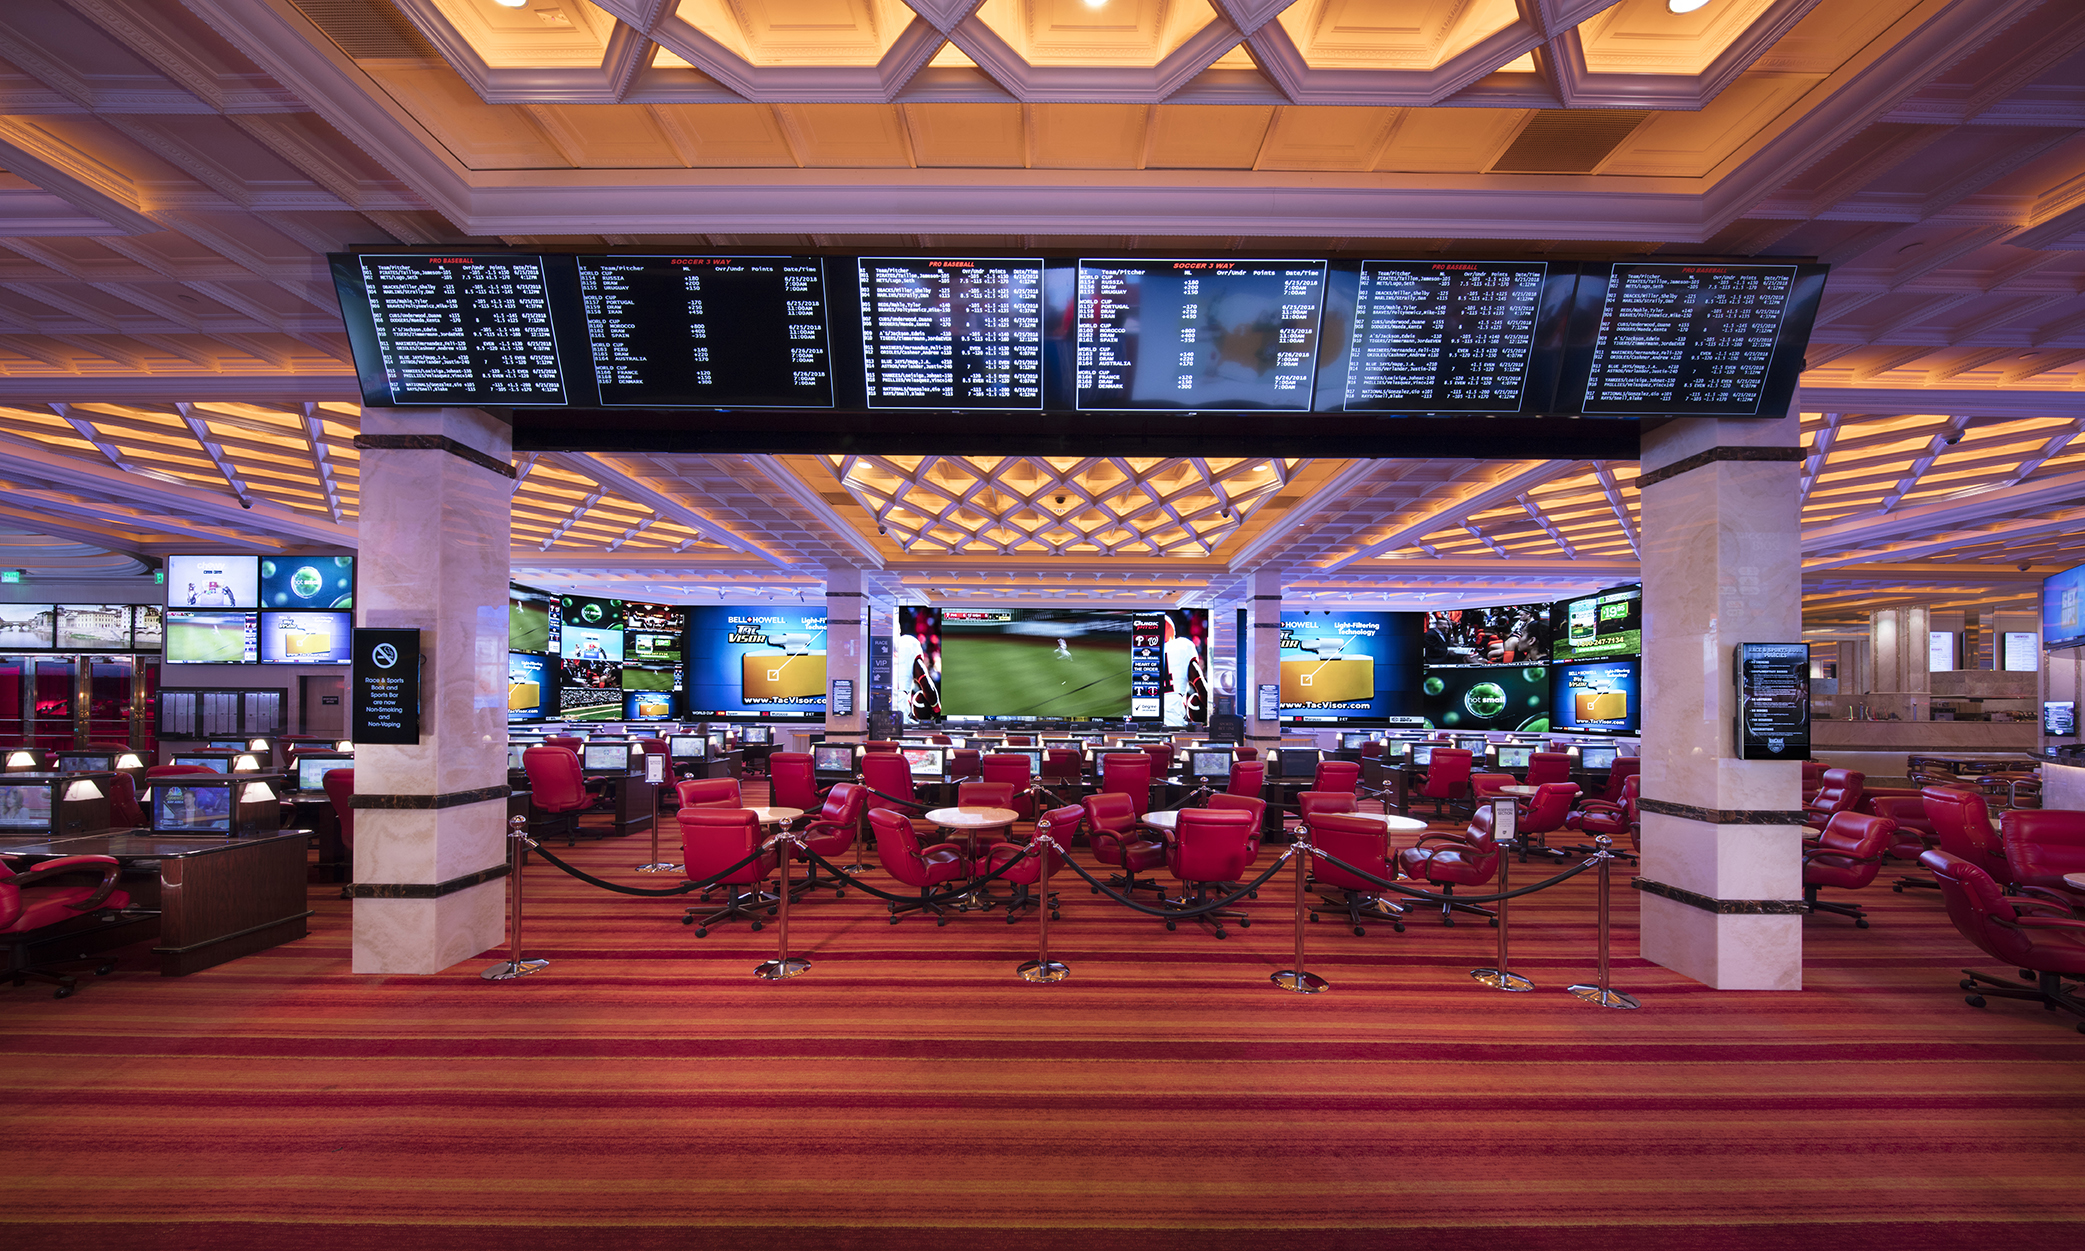 Reno casinos sports betting mining bitcoins difficulty